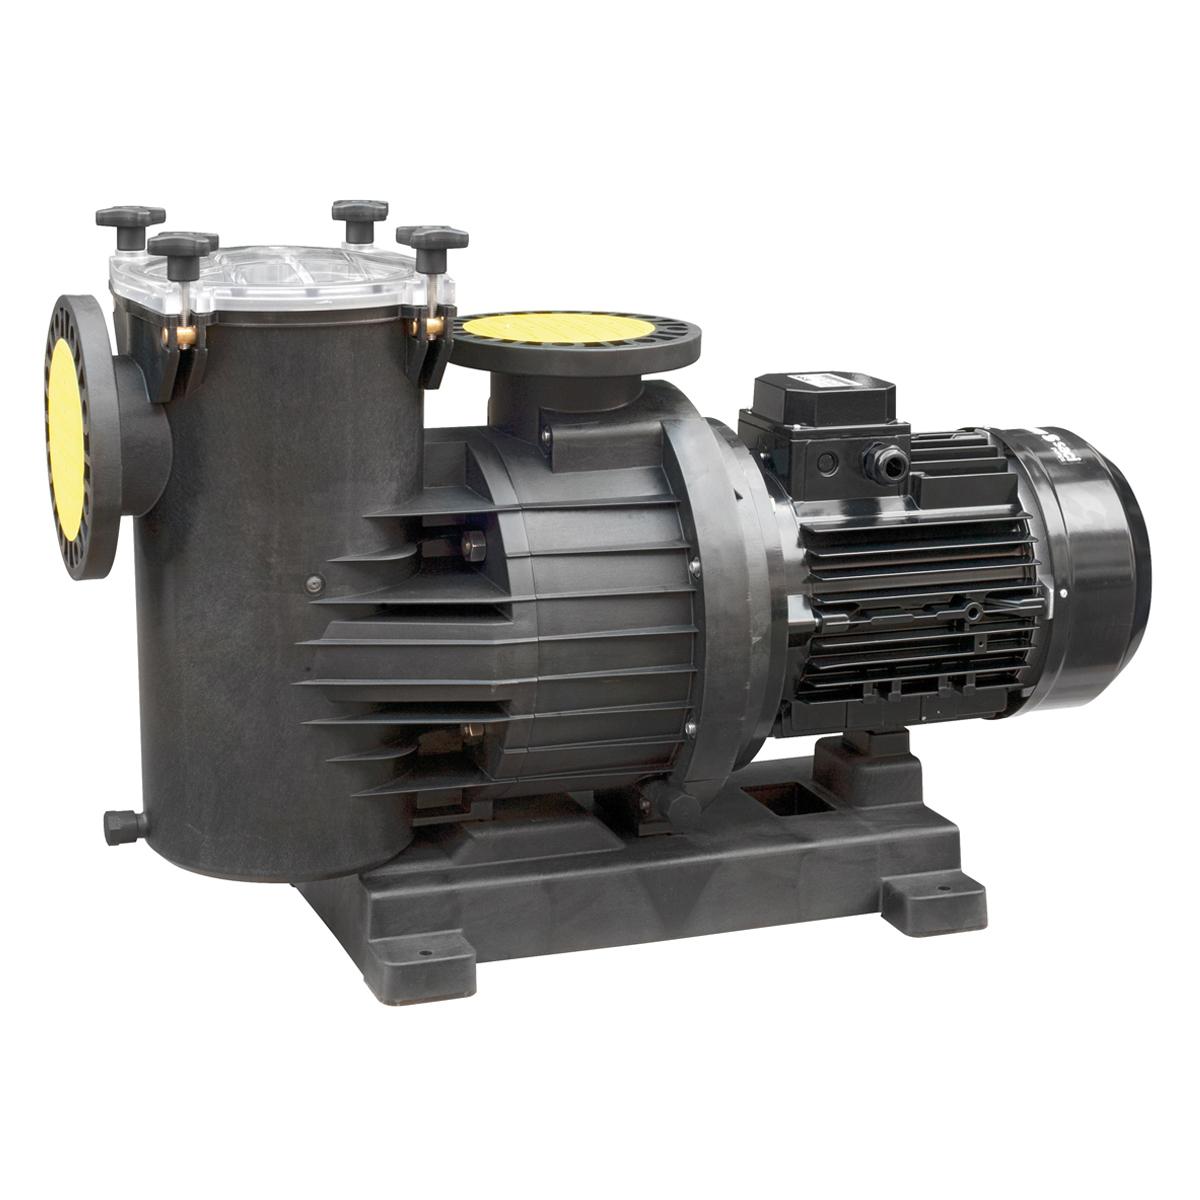 Smart Power Filterpumpe 300 230-400V, 1450 U/min 2,2 kW, 3 HP, 43 m³/h bei 10m Smart Power Filterpumpe 300 230-400V, 1450 U/min 2,2 kW, 3 HP, 43 m³/h bei 10m